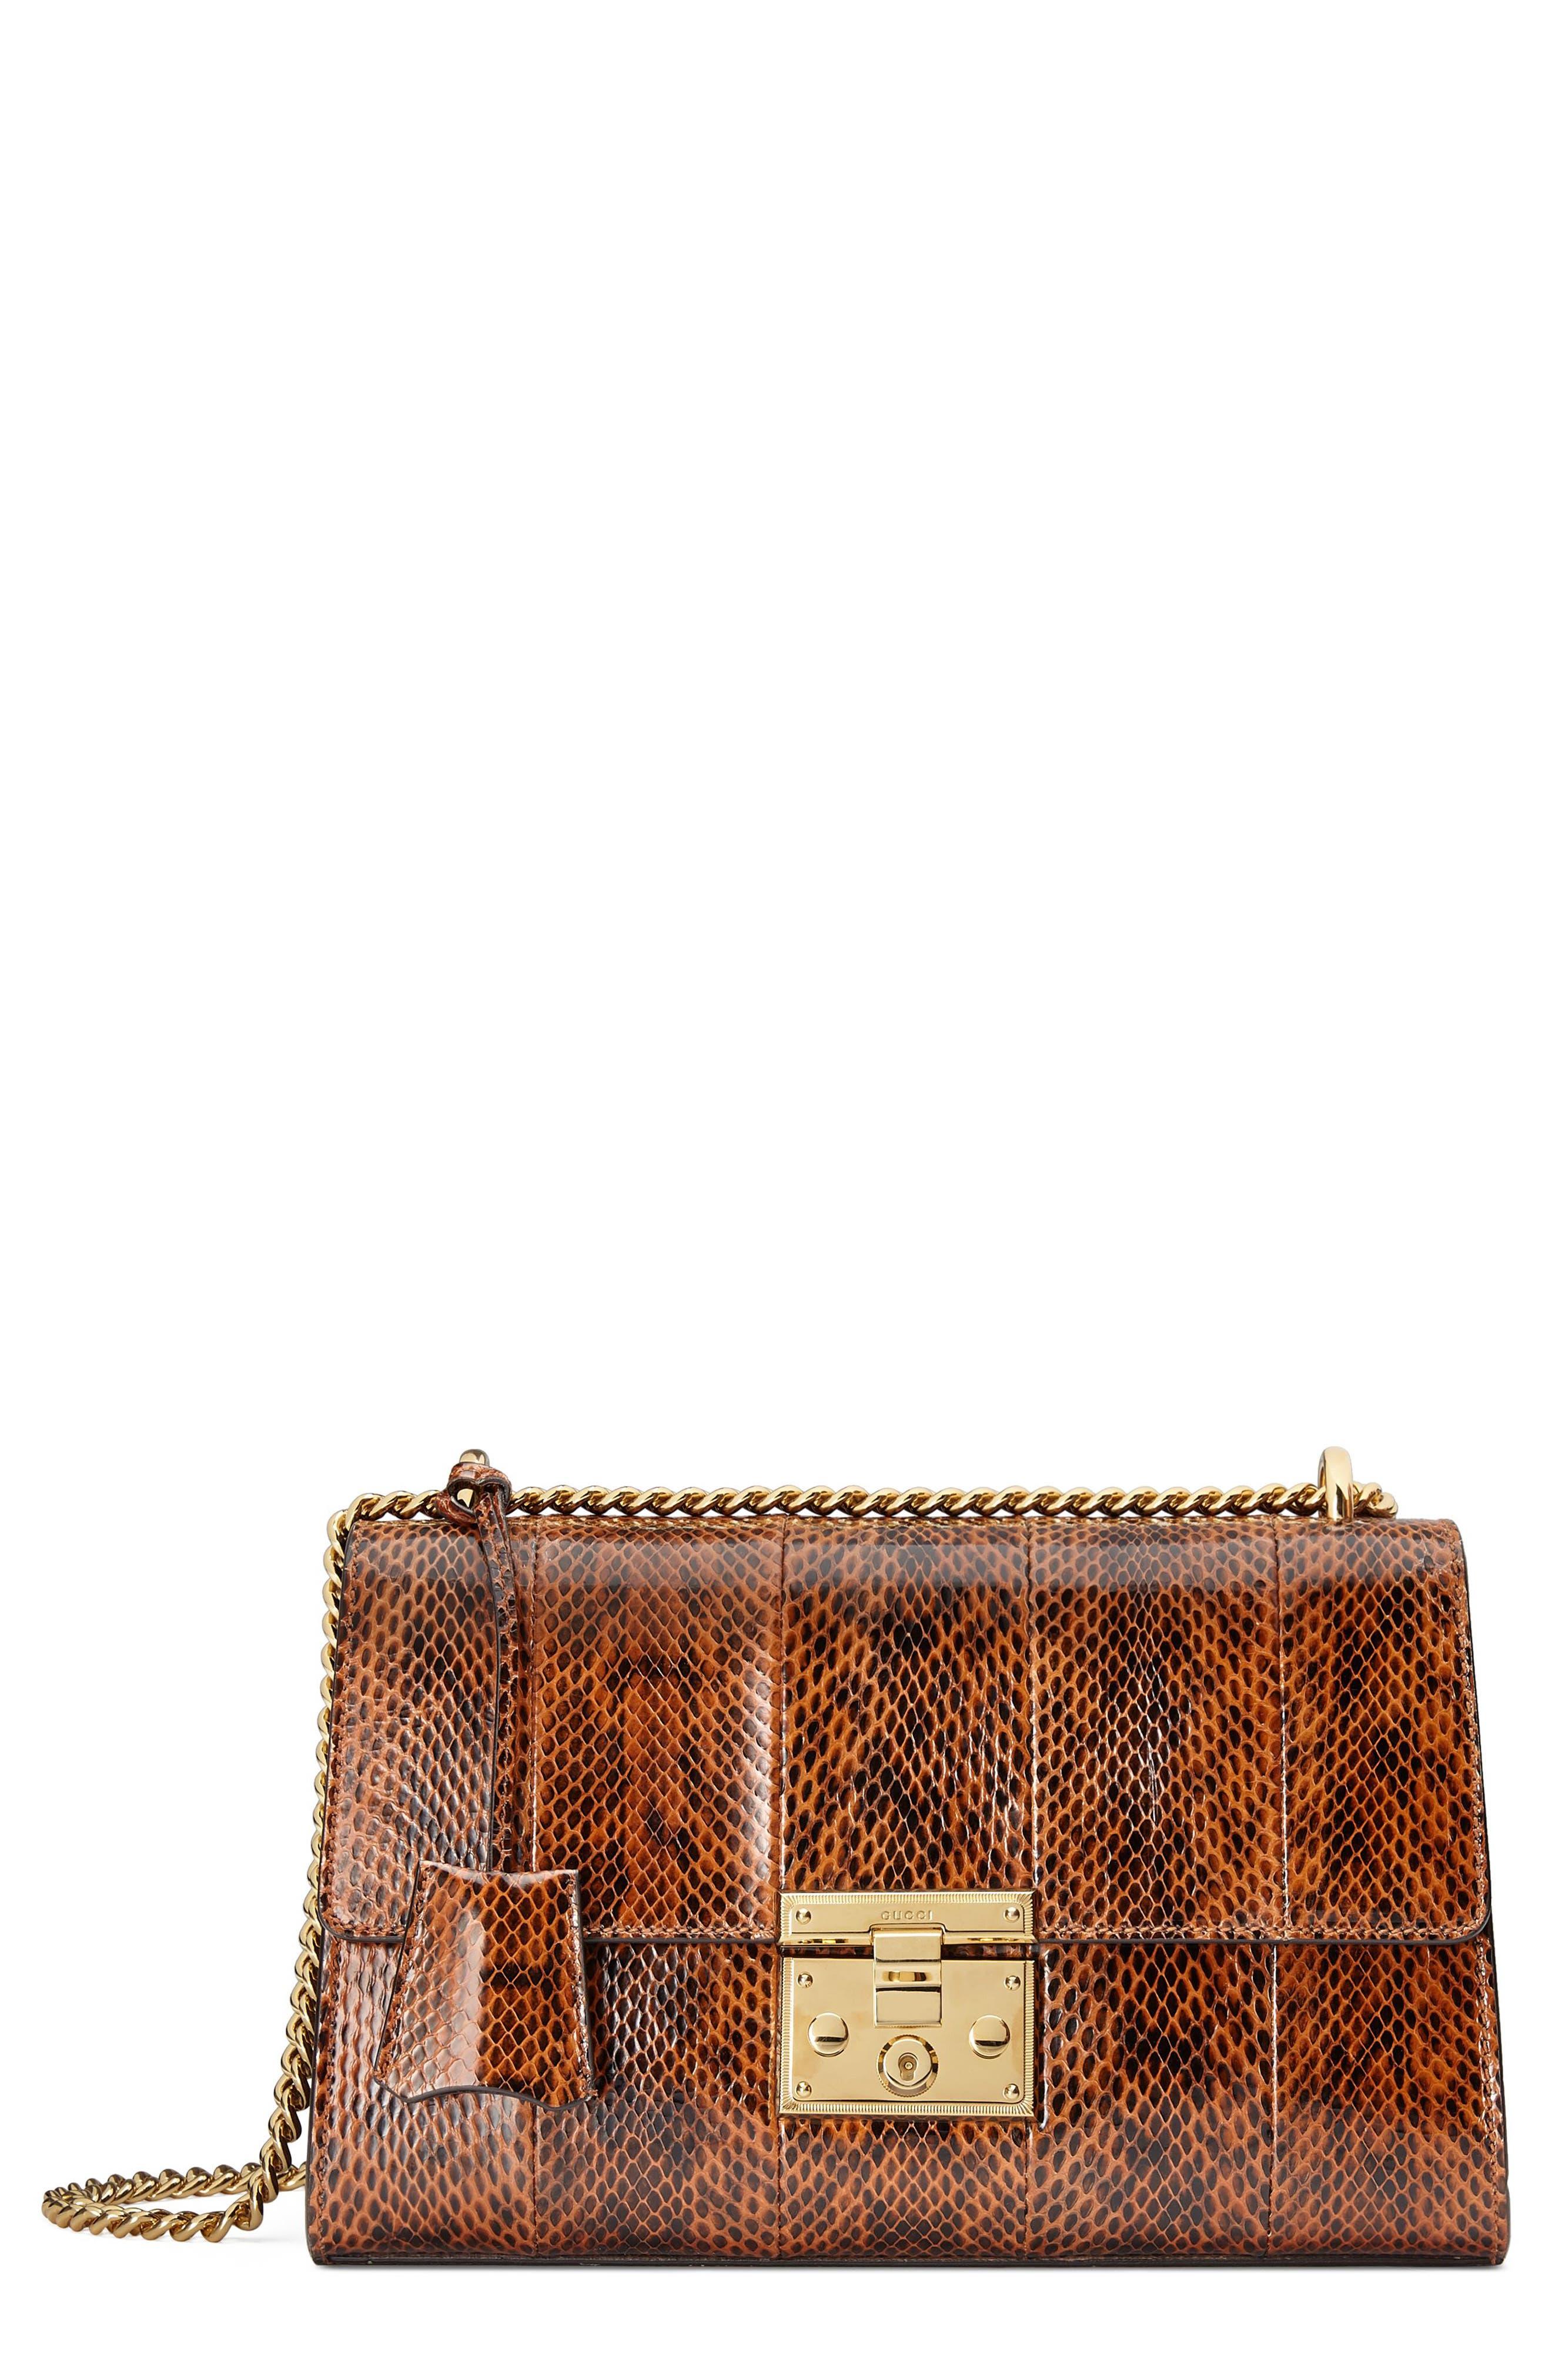 Alternate Image 1 Selected - Gucci Medium Padlock - Elaphe Genuine Snakeskin Shoulder Bag